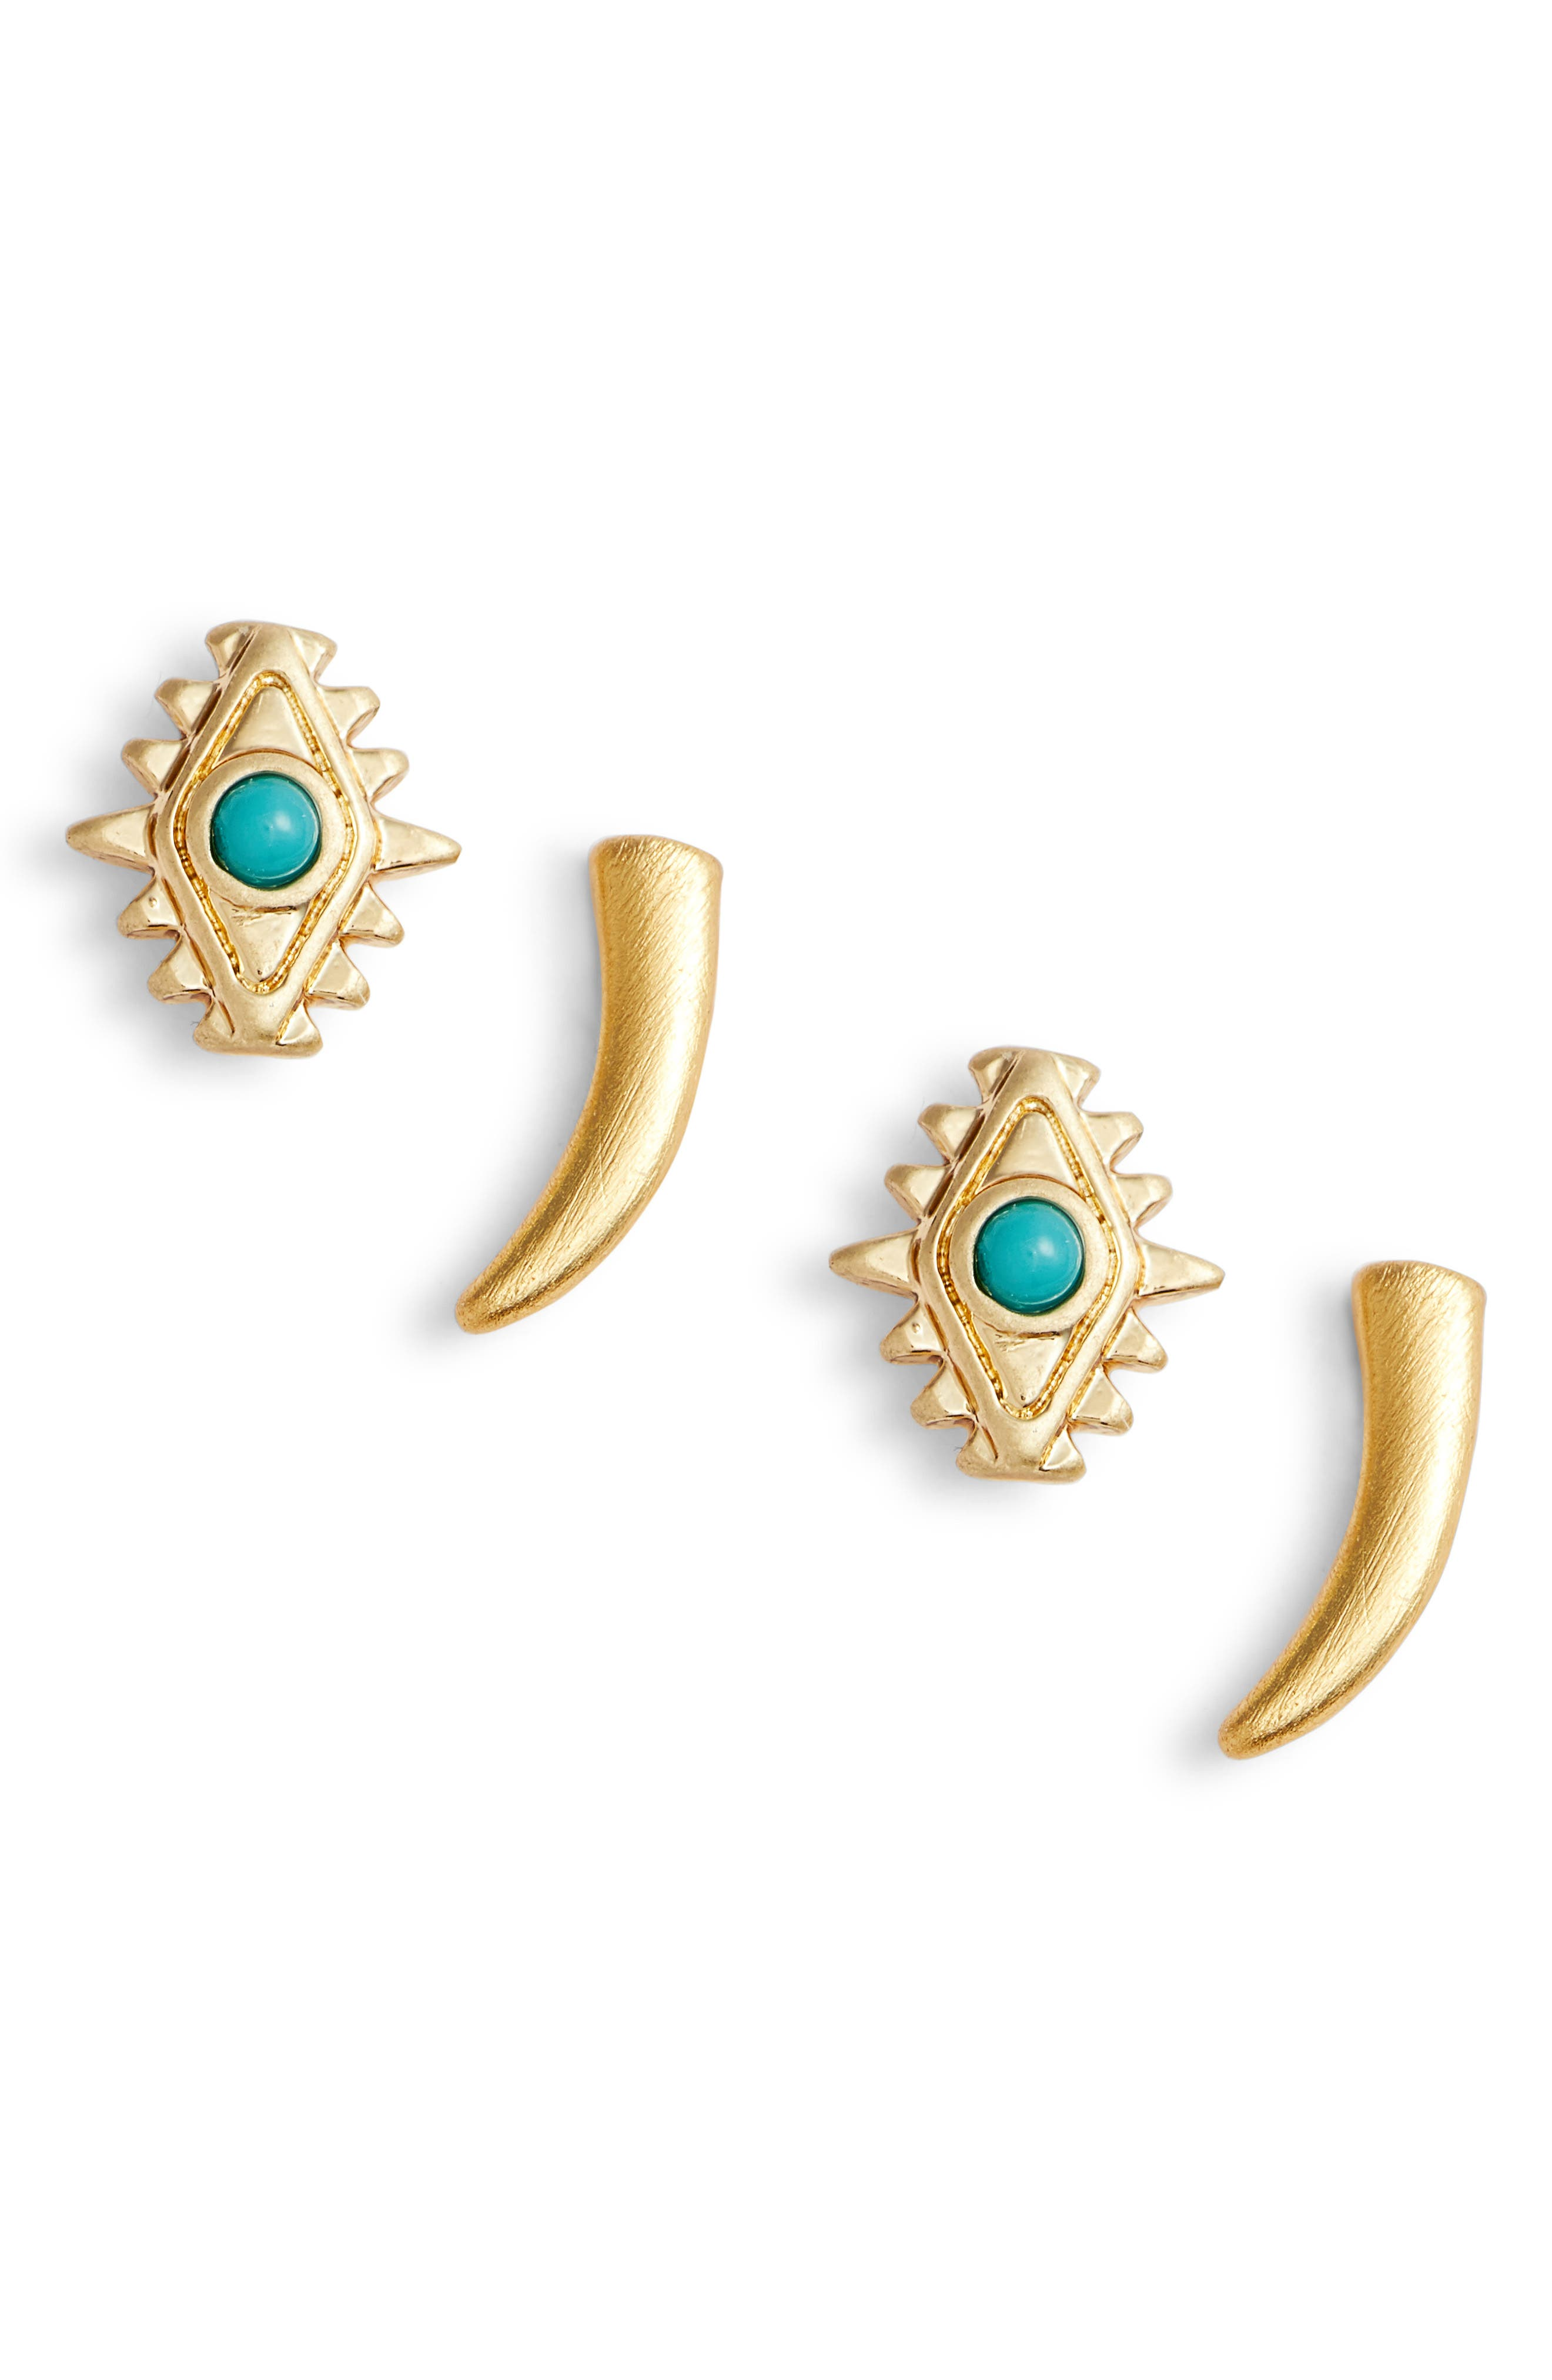 Set of 2 Stud Earrings,                         Main,                         color,